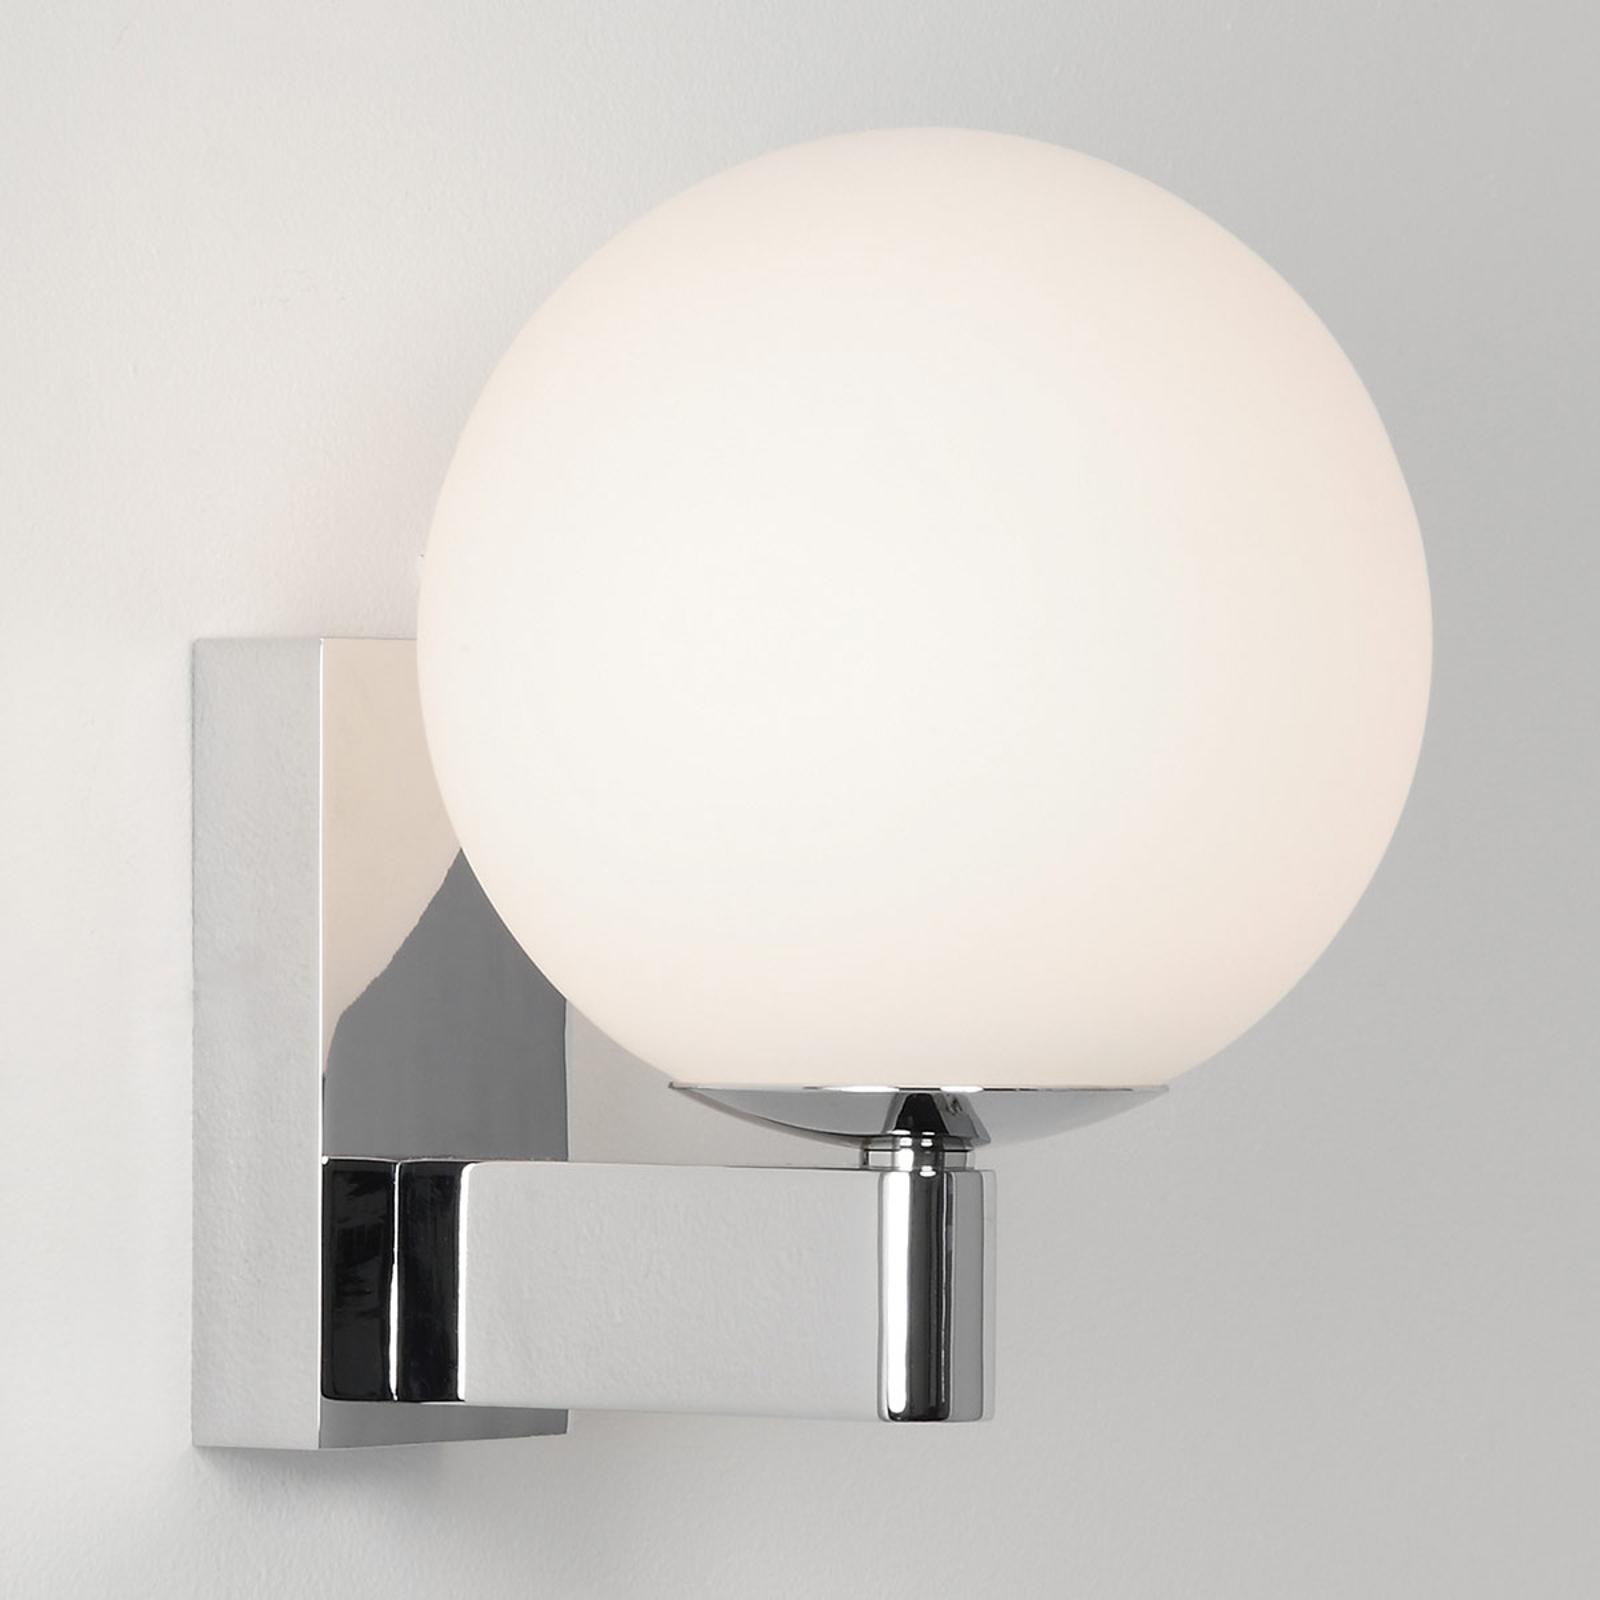 Astro Sagara koupelnové světlo, tvar koule, chrom